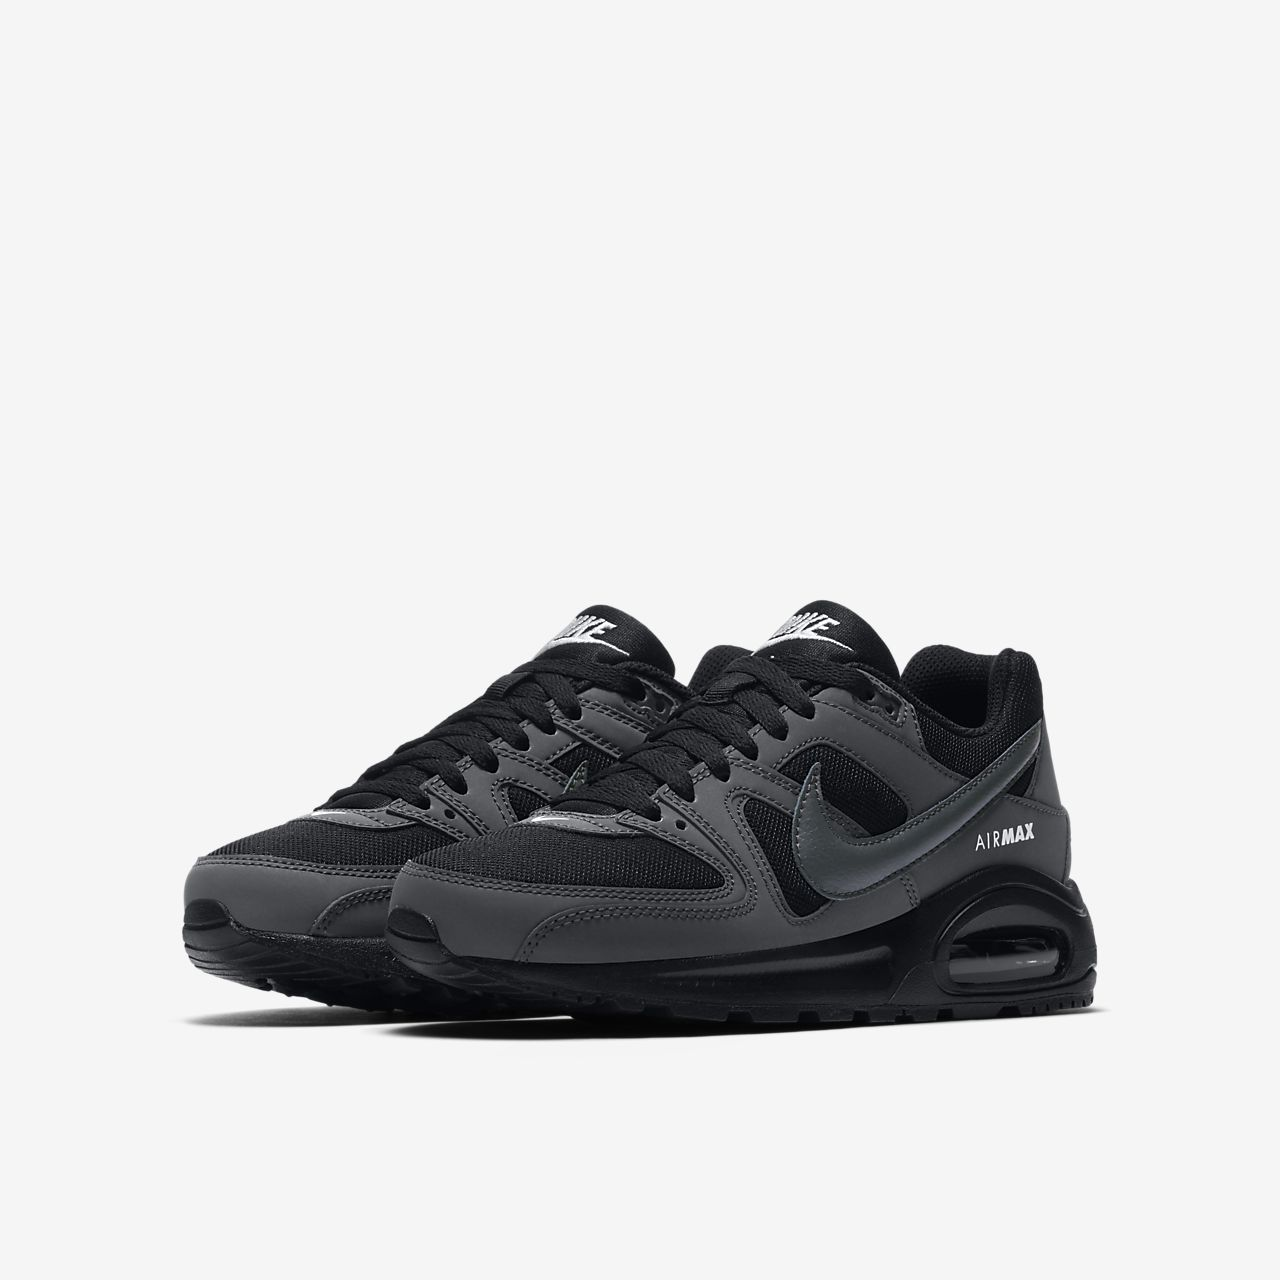 c3e17592cee14 Nike Air Max Command Flex Older Kids  Shoe. Nike.com GB